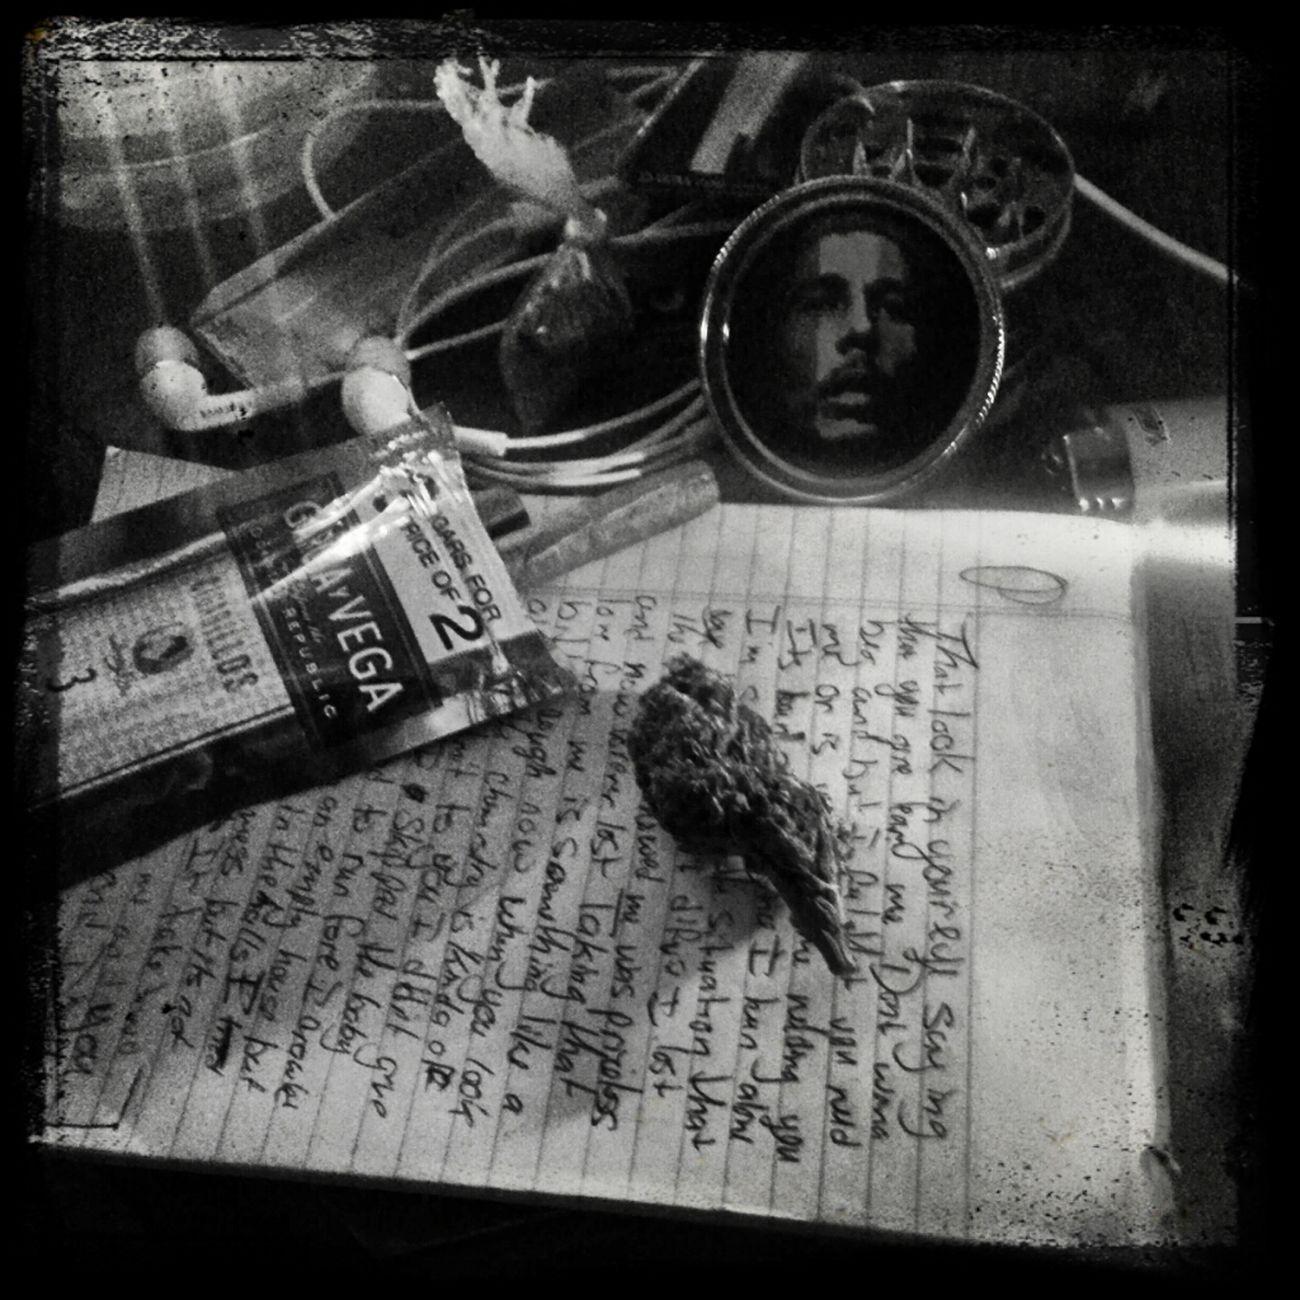 Working Hard Music Candles Smoking Weed Bob Marley Weed DOPE Memphis Stoner BFR TheSmokeyKiss